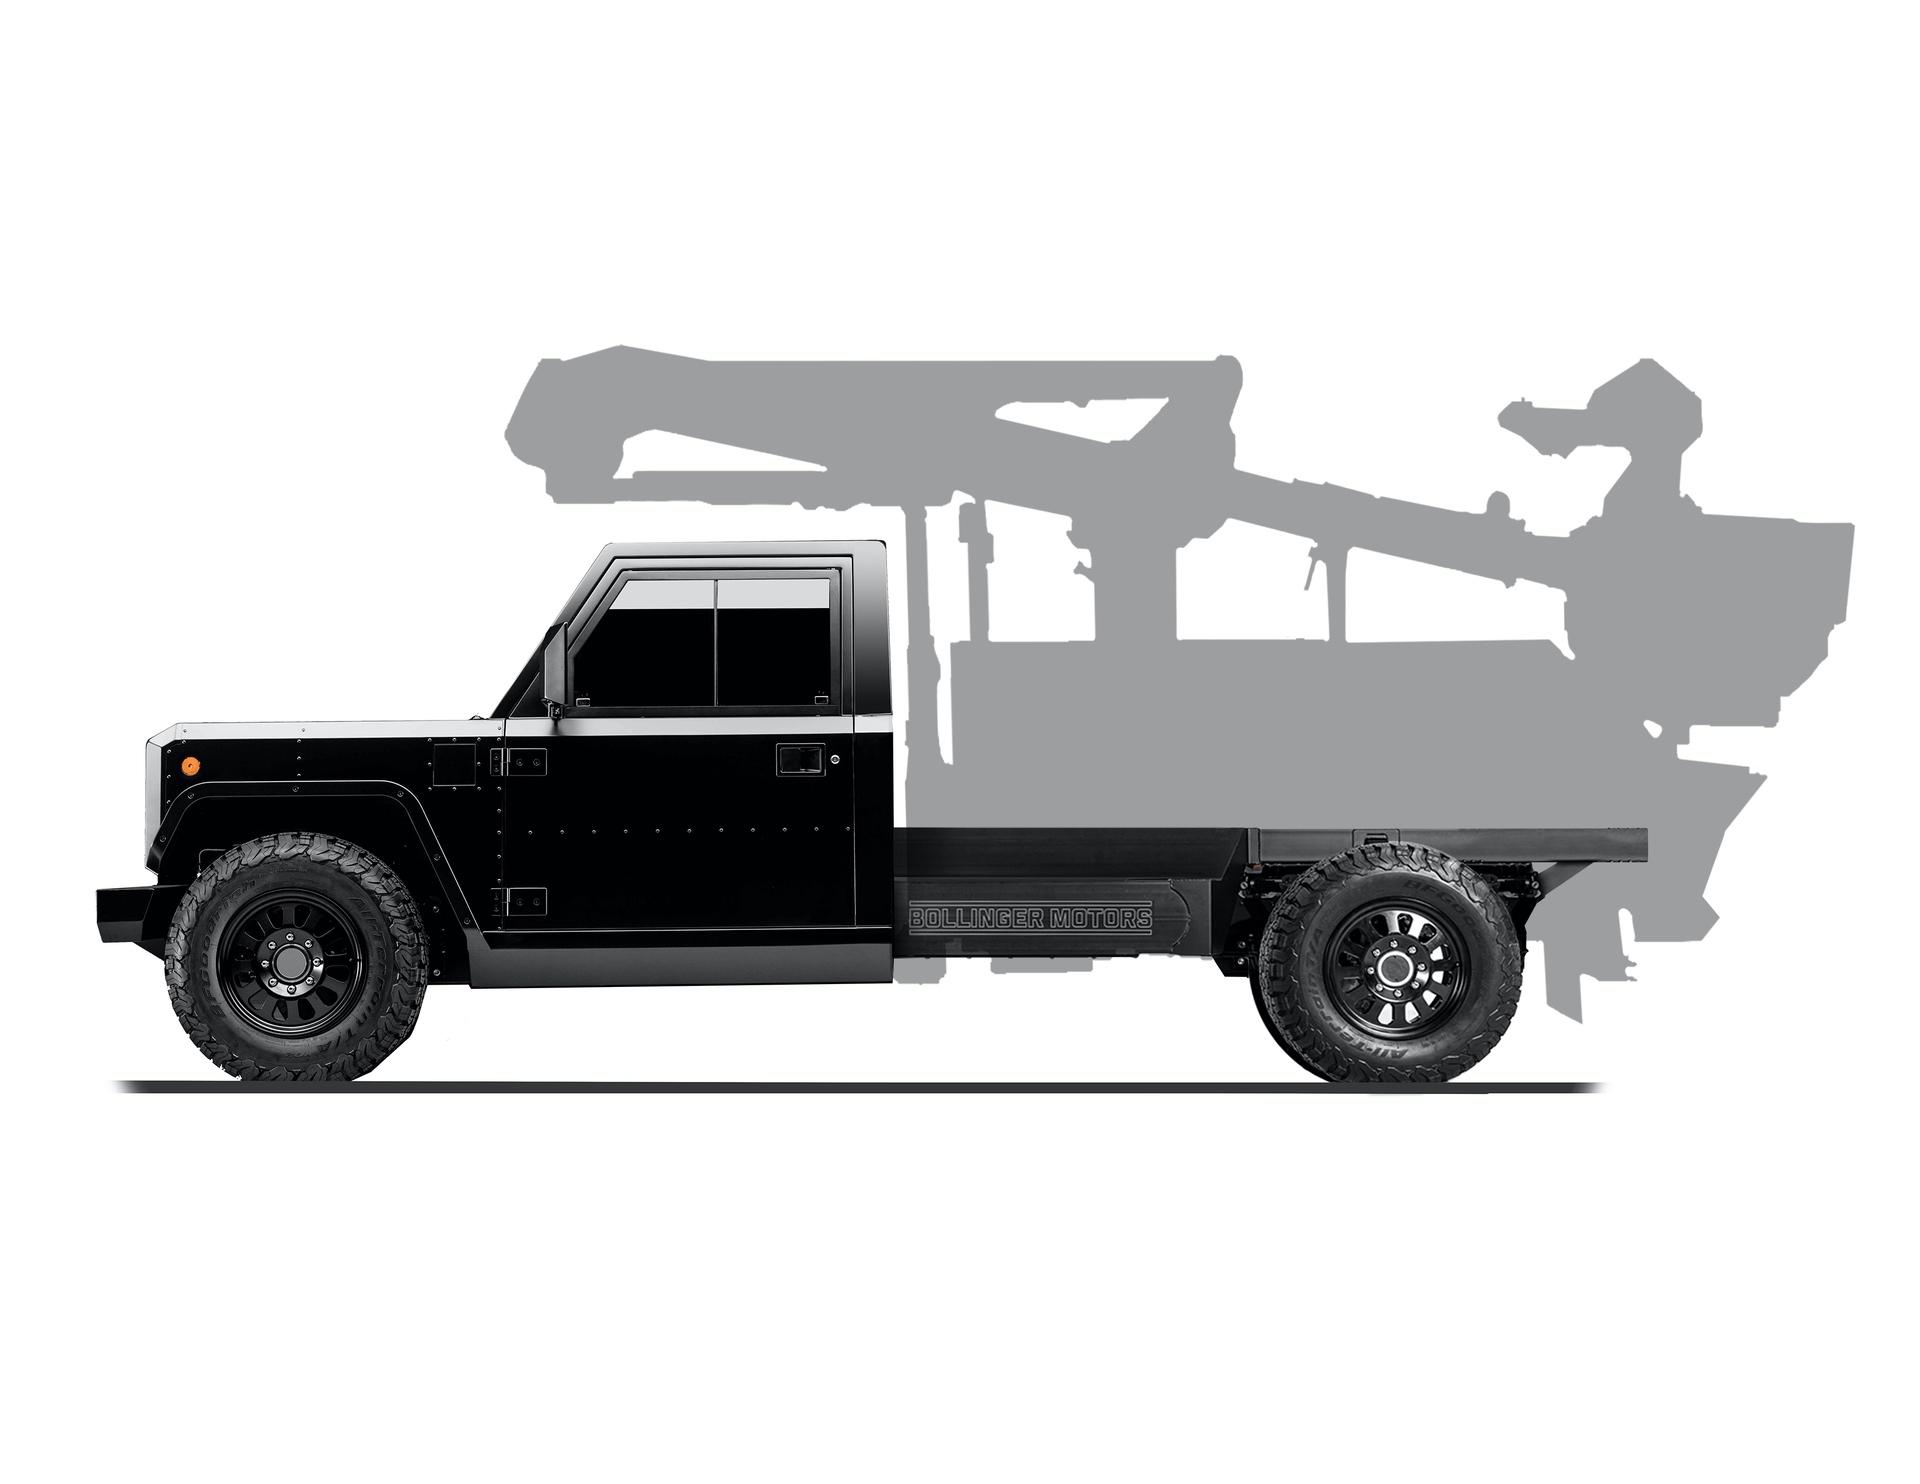 Bollinger-Motors-B2-Chassis-Cab-Bucket-Truck-side